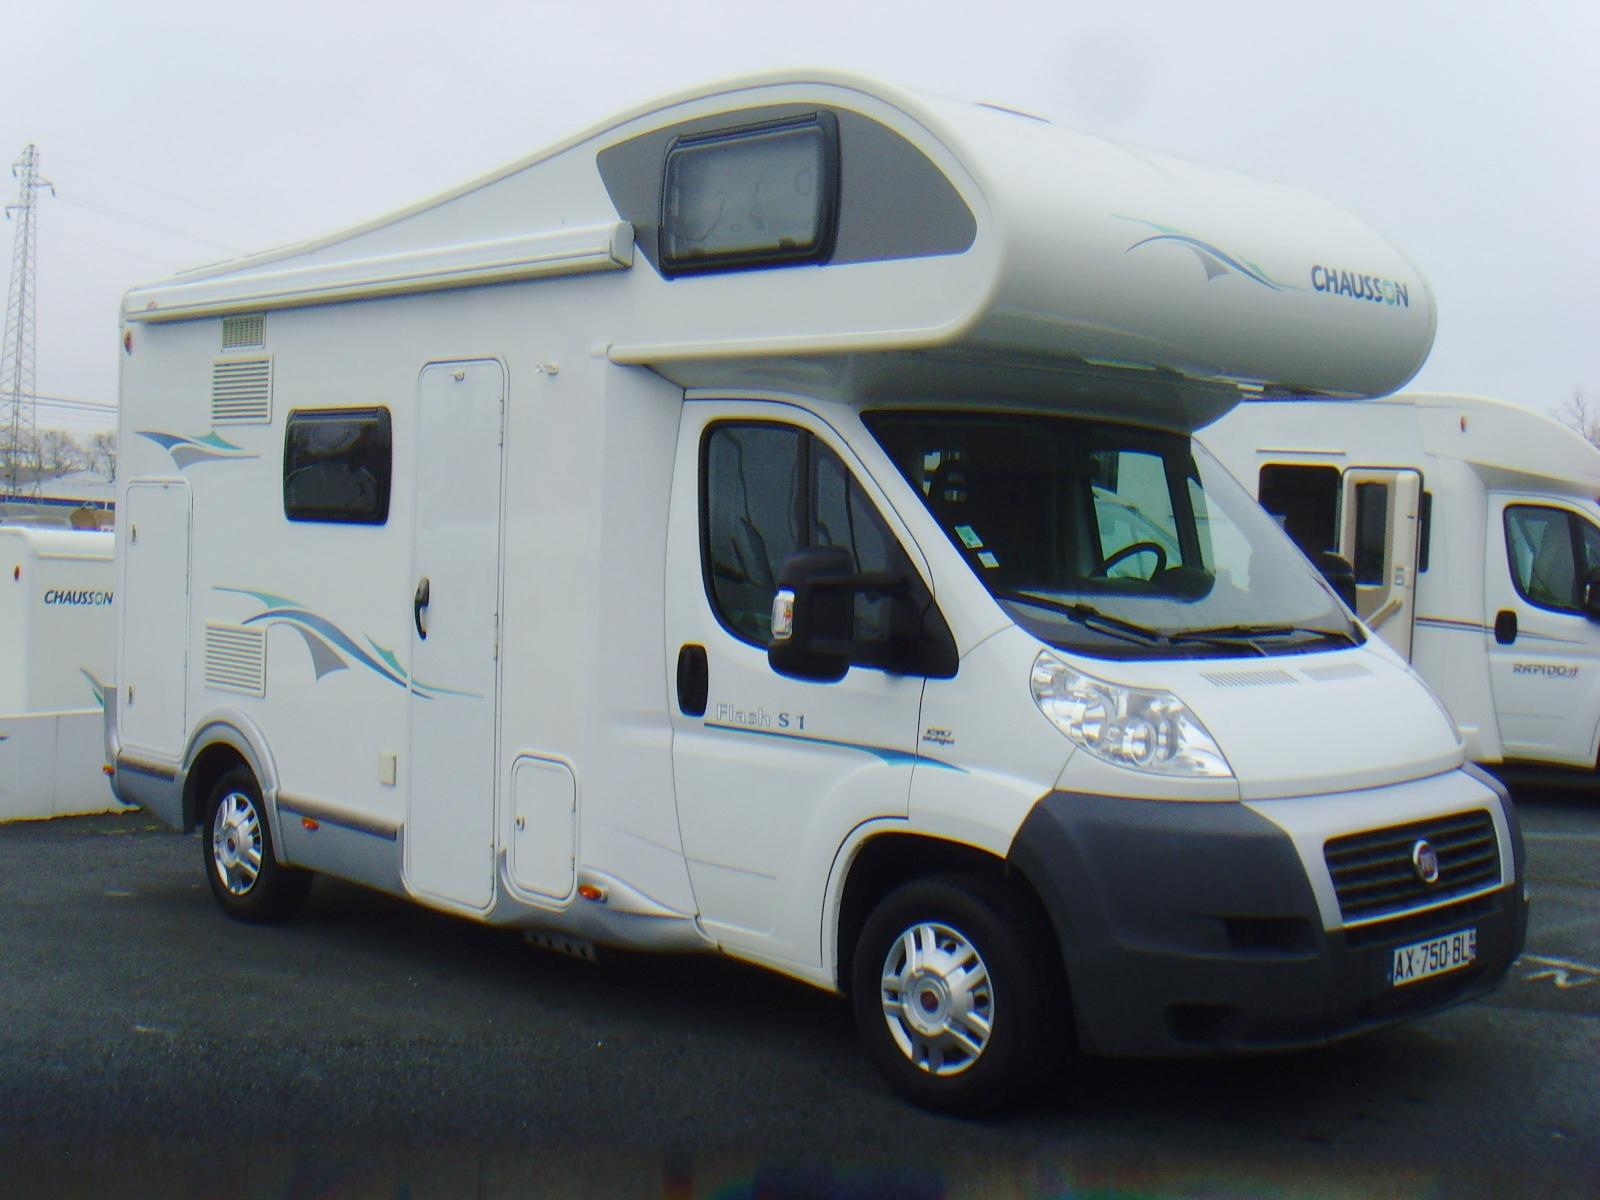 chausson flash s1 occasion de 2010 fiat camping car en vente bayonne pyrenees atlantiques 64. Black Bedroom Furniture Sets. Home Design Ideas